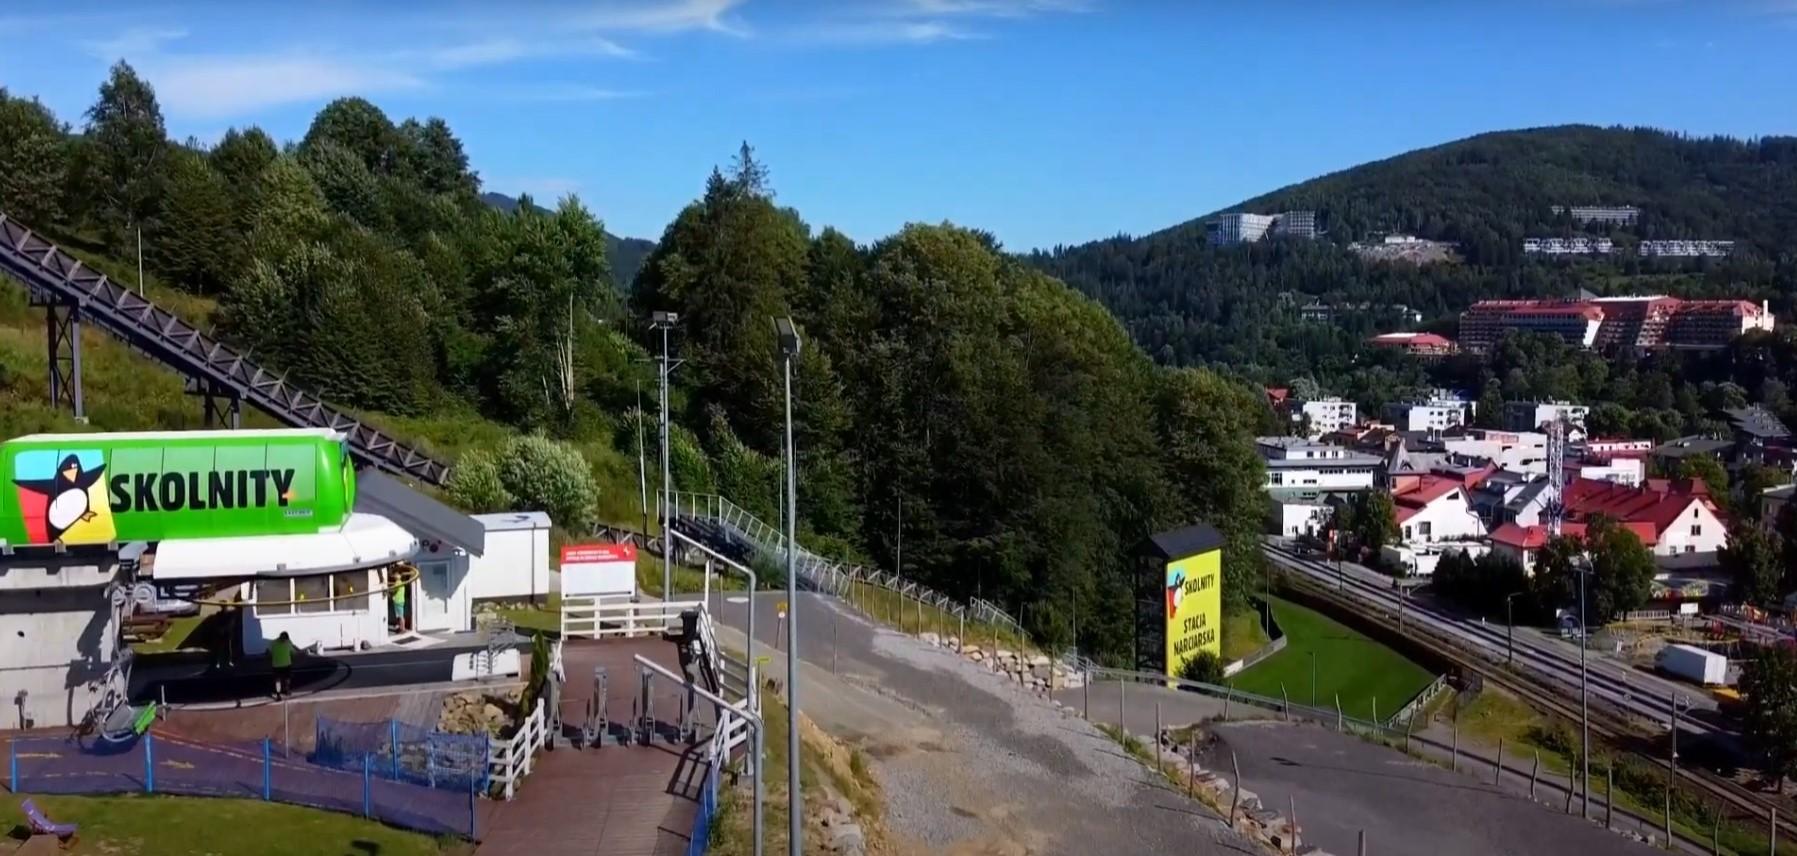 Skolnity Ski & Bike Park z lotu ptaka